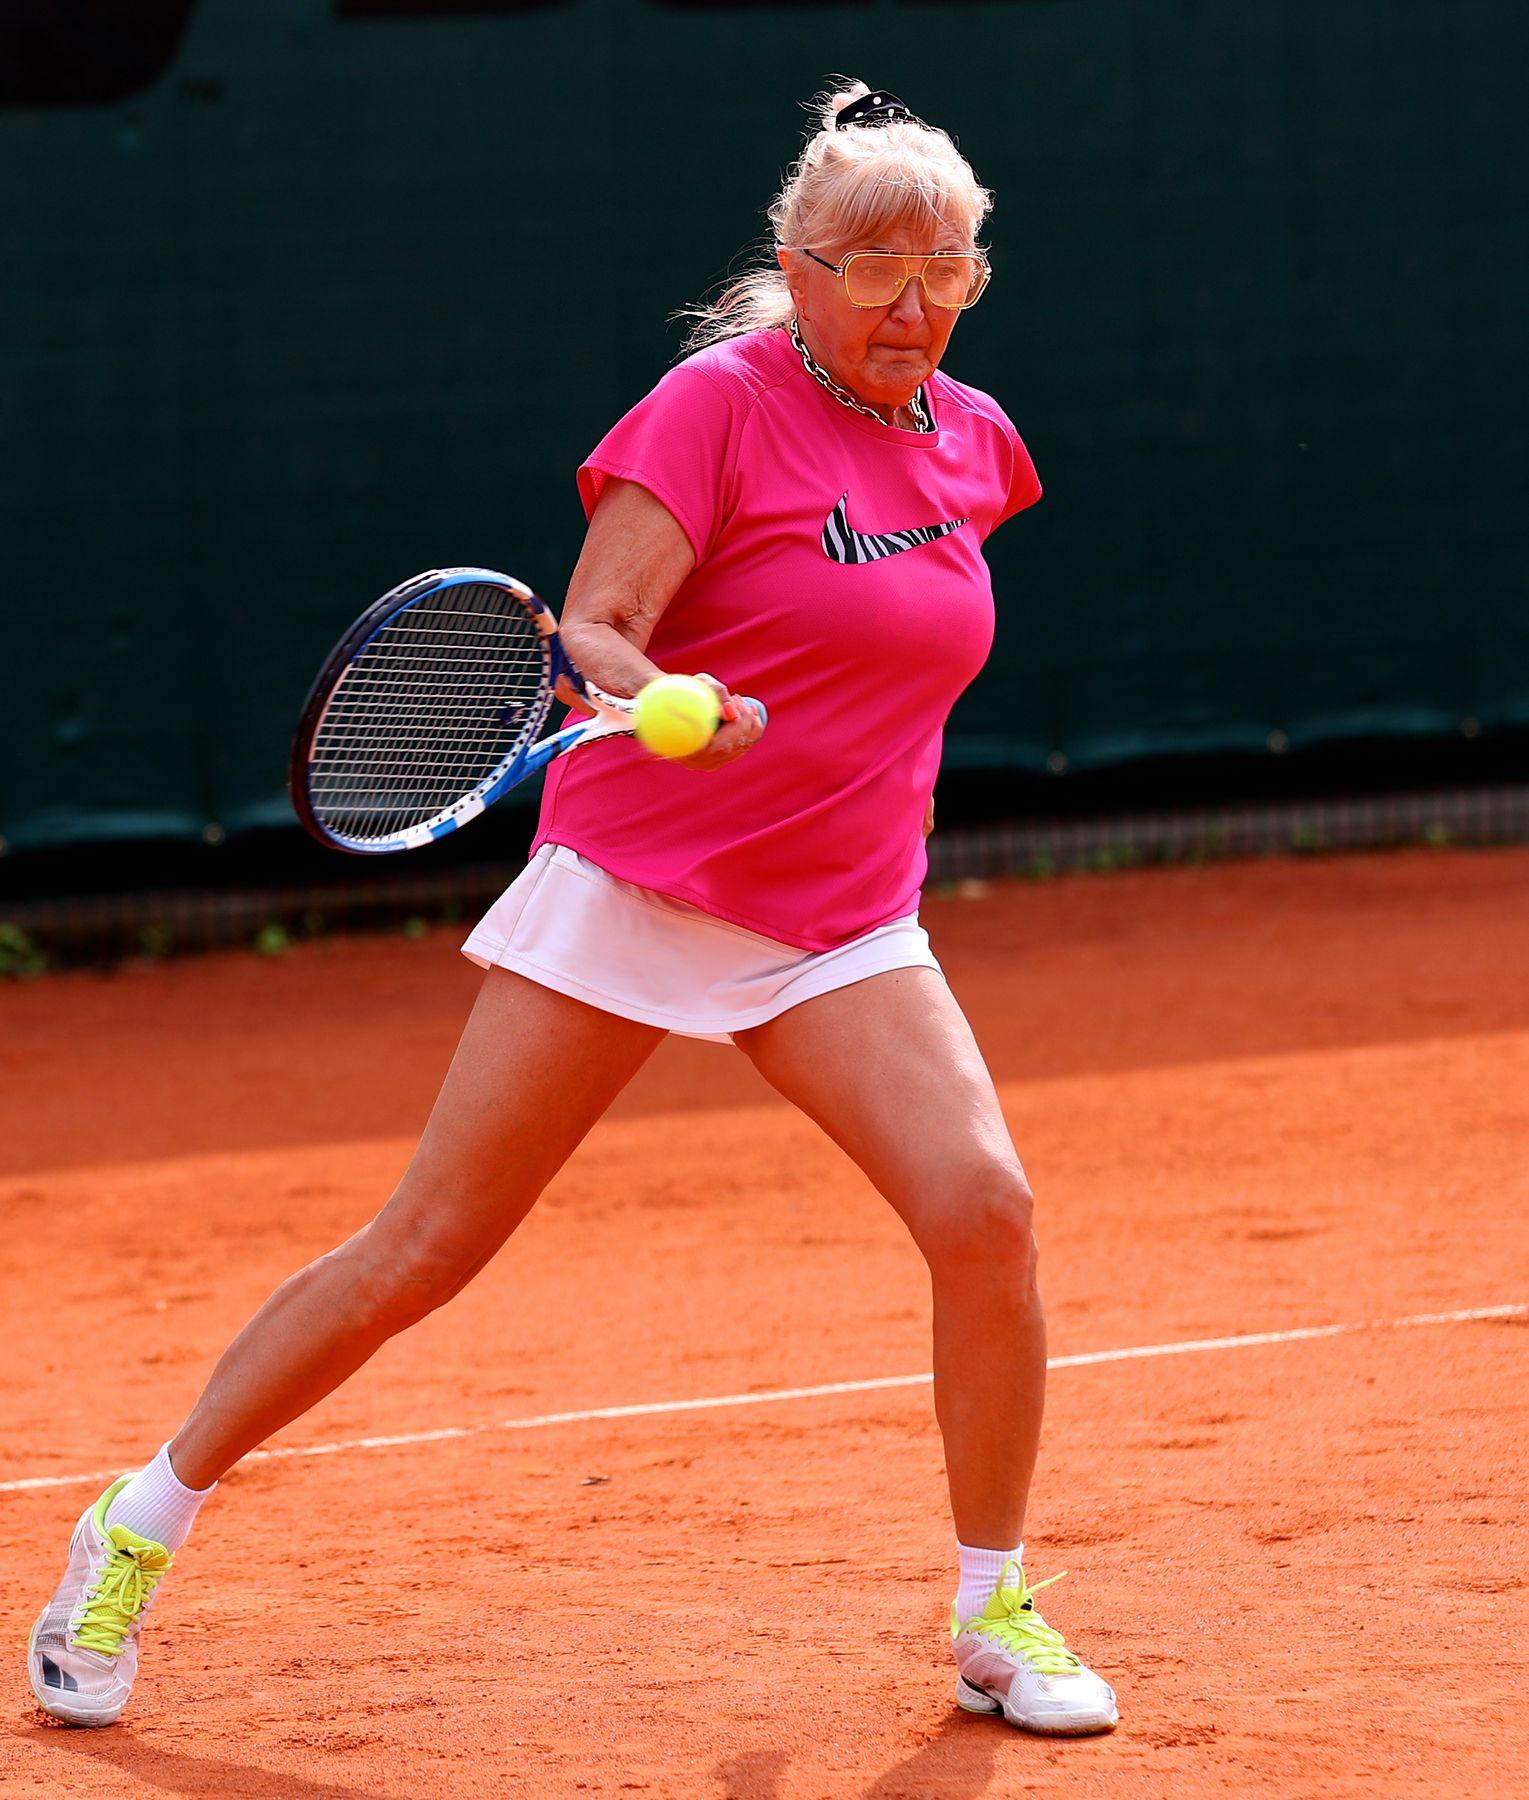 Ветеранский теннис... tennis big ITF moscow player racket russia ball RTT Alextennis Seniors Cup